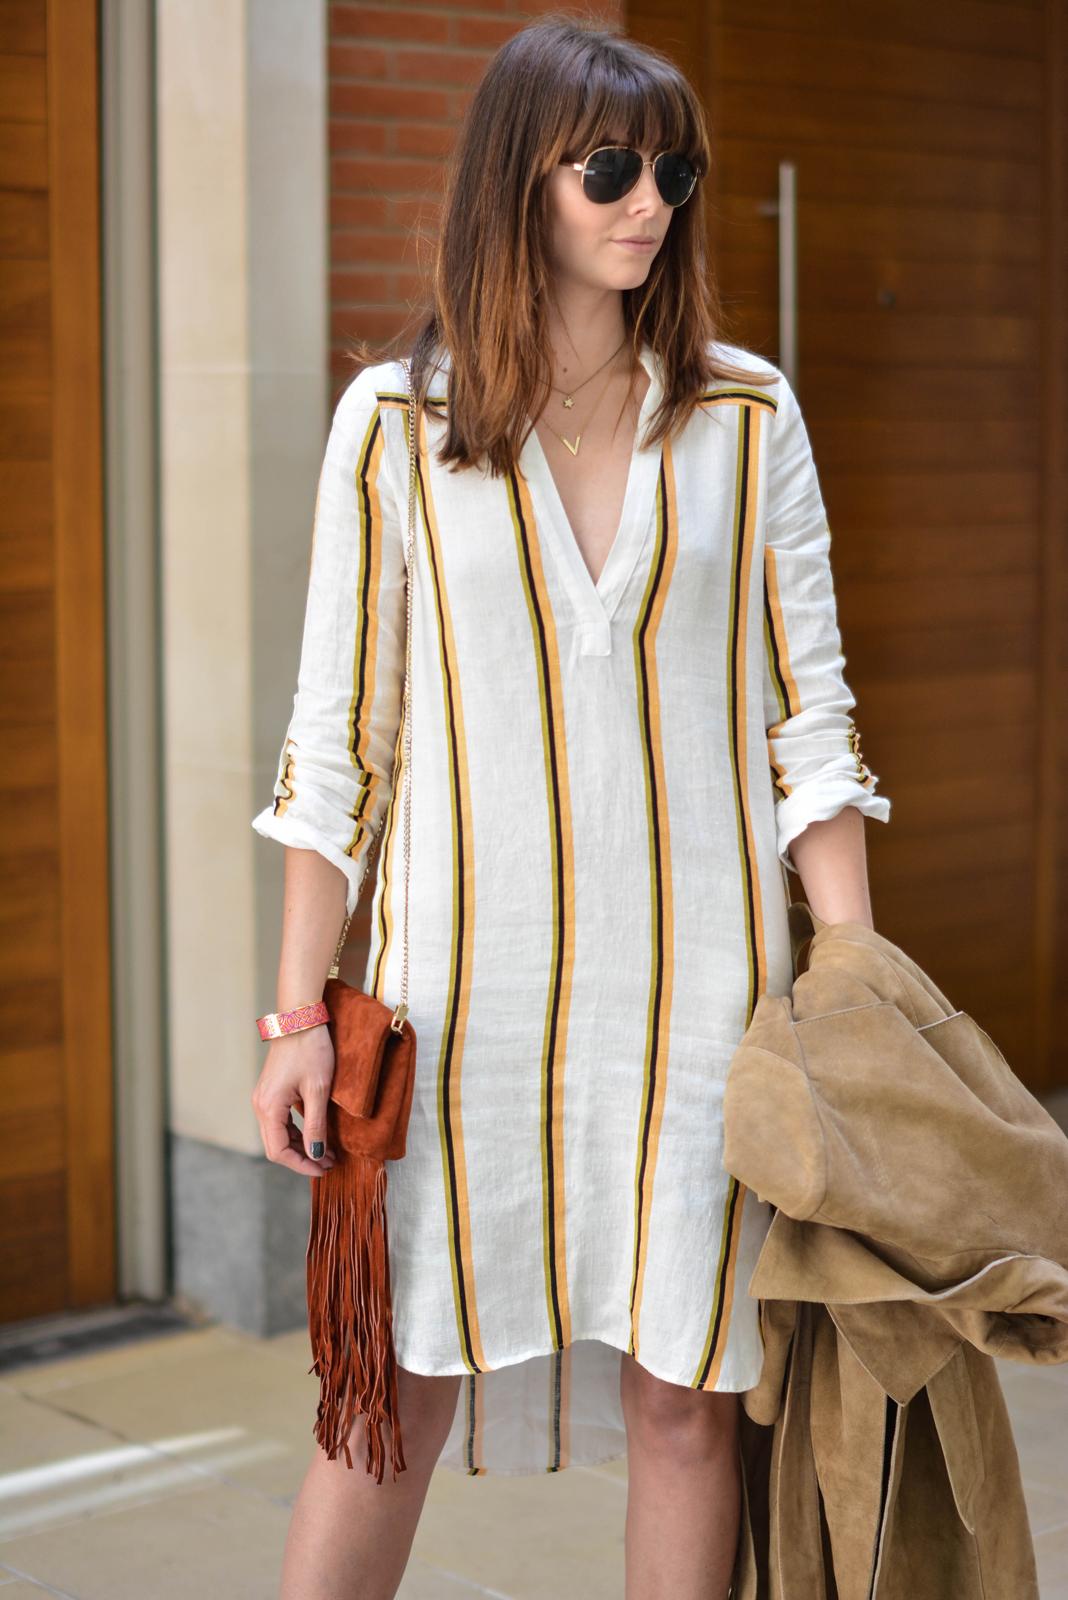 EJSTYLE - Emma Hill wears H&M linen stripe shirt dress, Gestuz suede trench coat, gold aviator sunglasses, Karen Millen suded fringe bag, OOTD